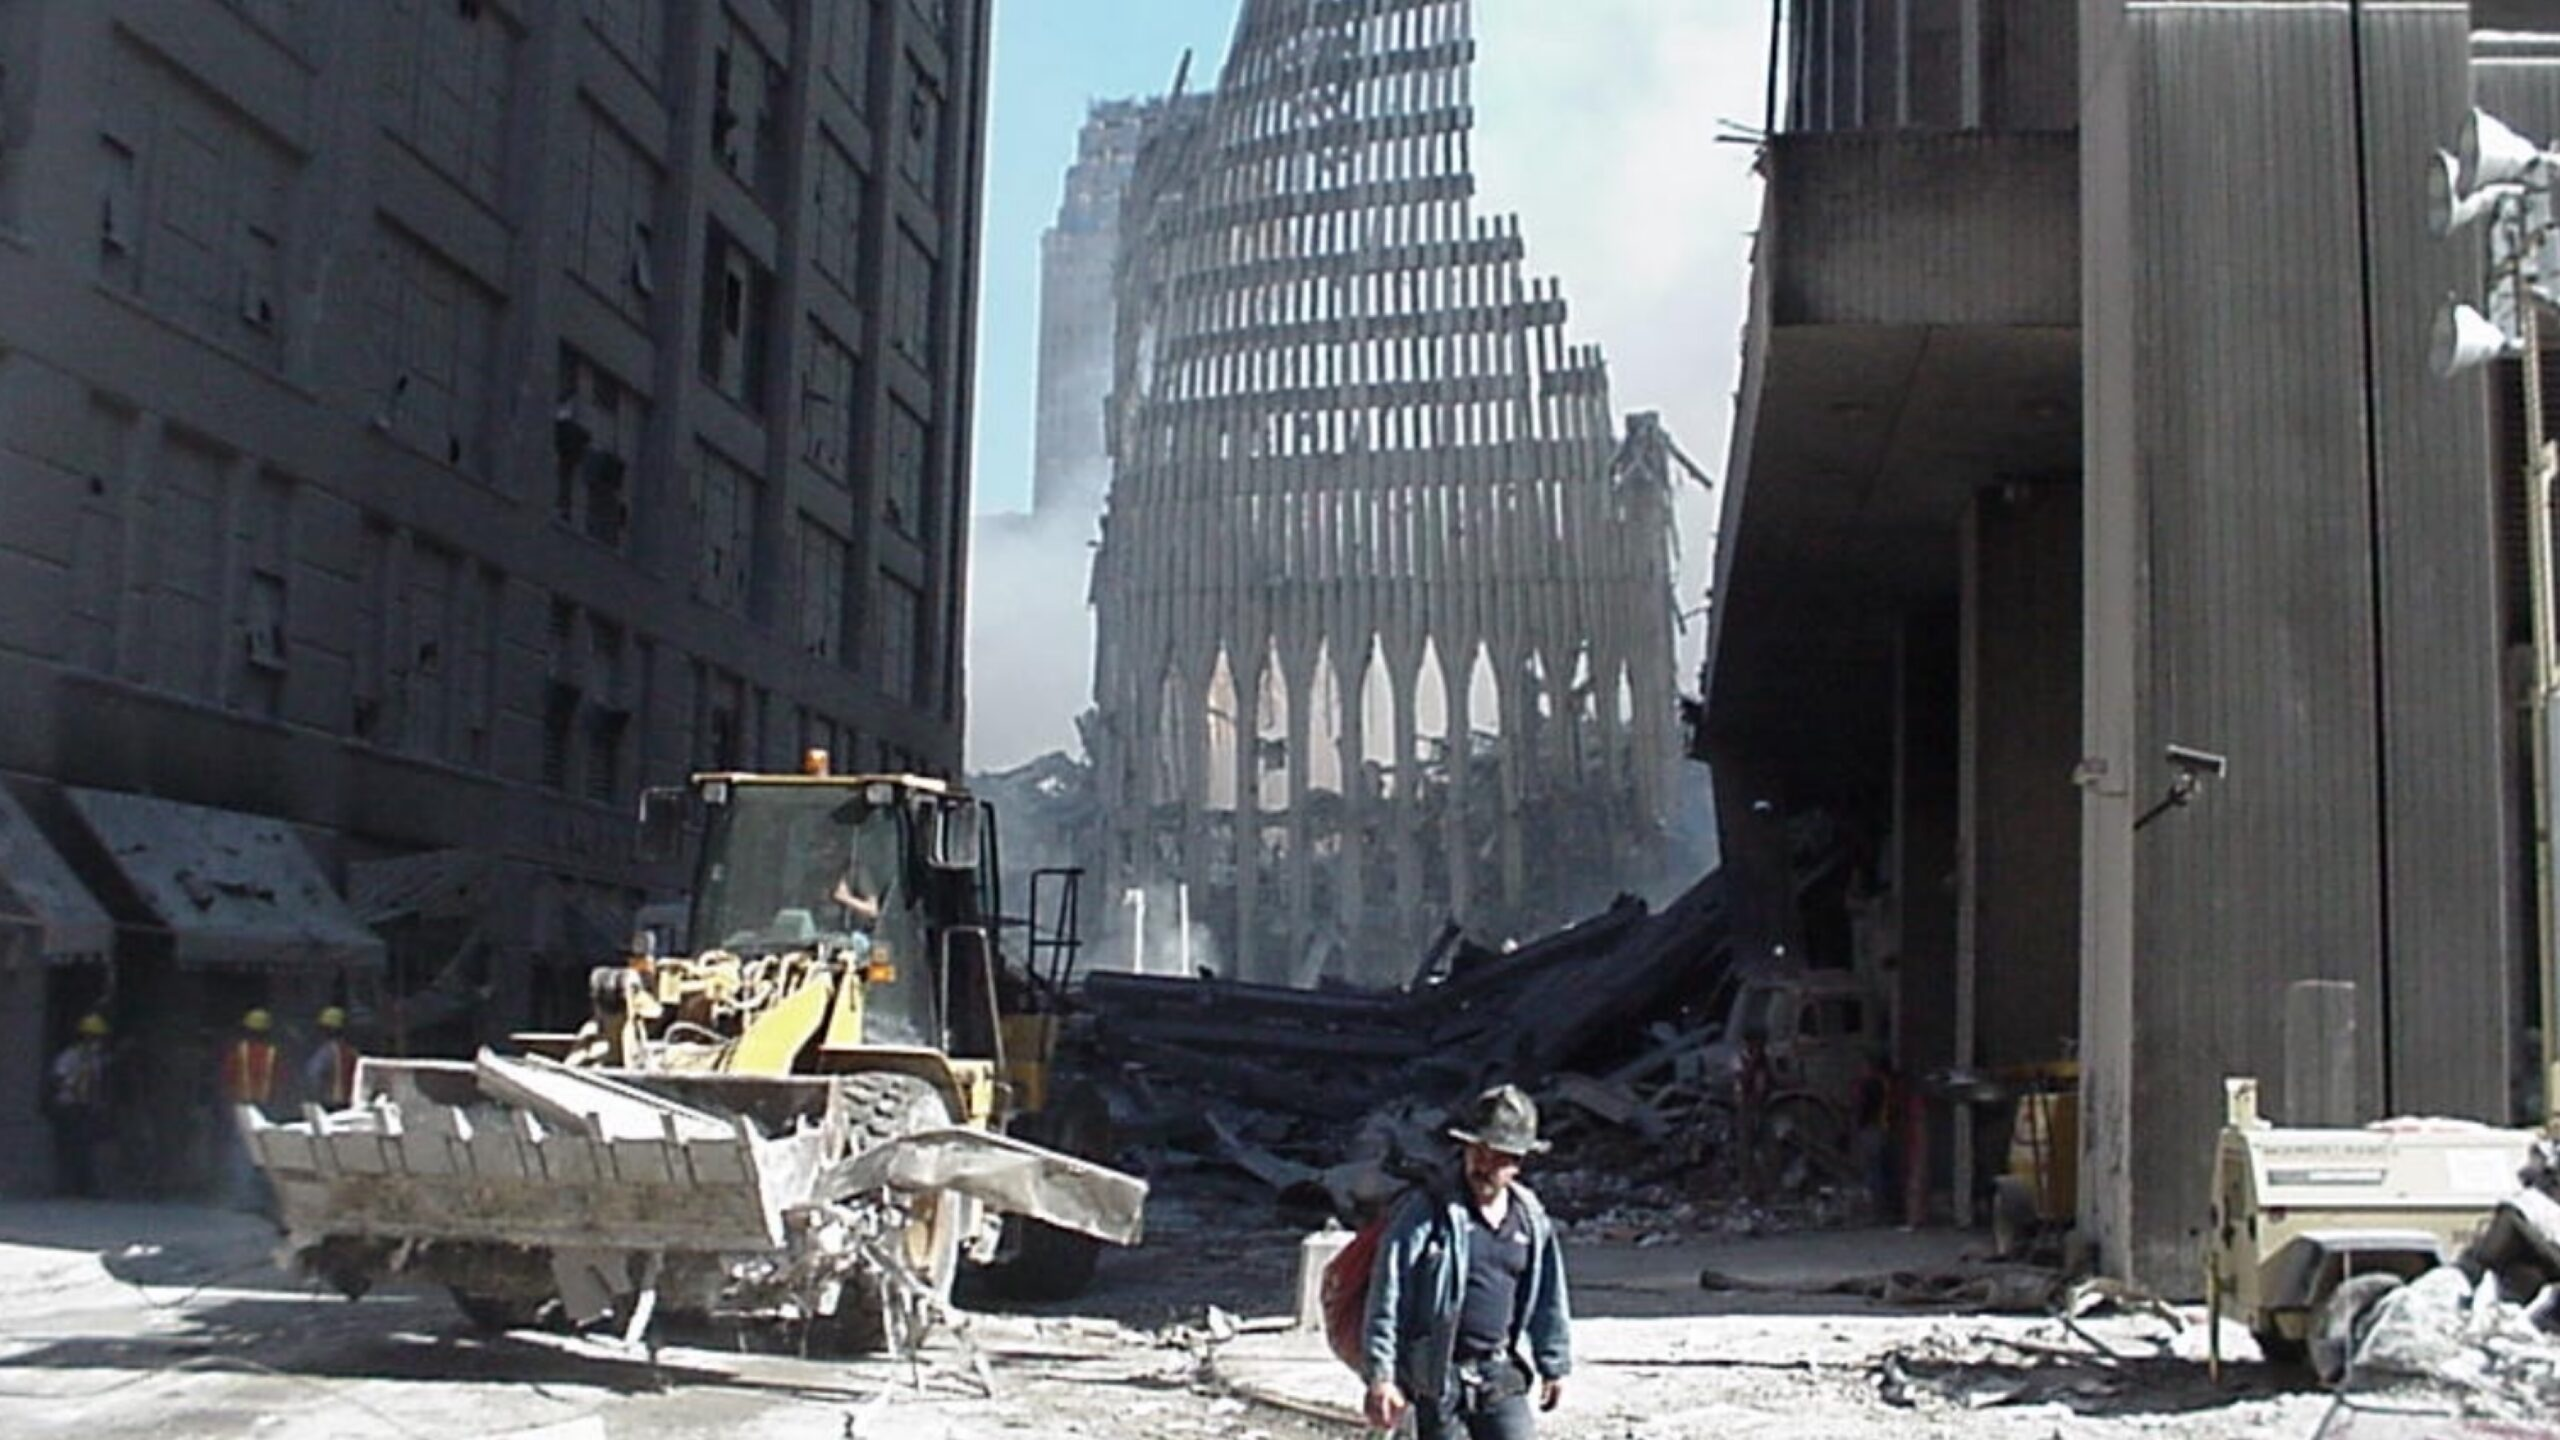 911, ataque terrorista, world trade center, nueva york, estados unidos, septiembre 11